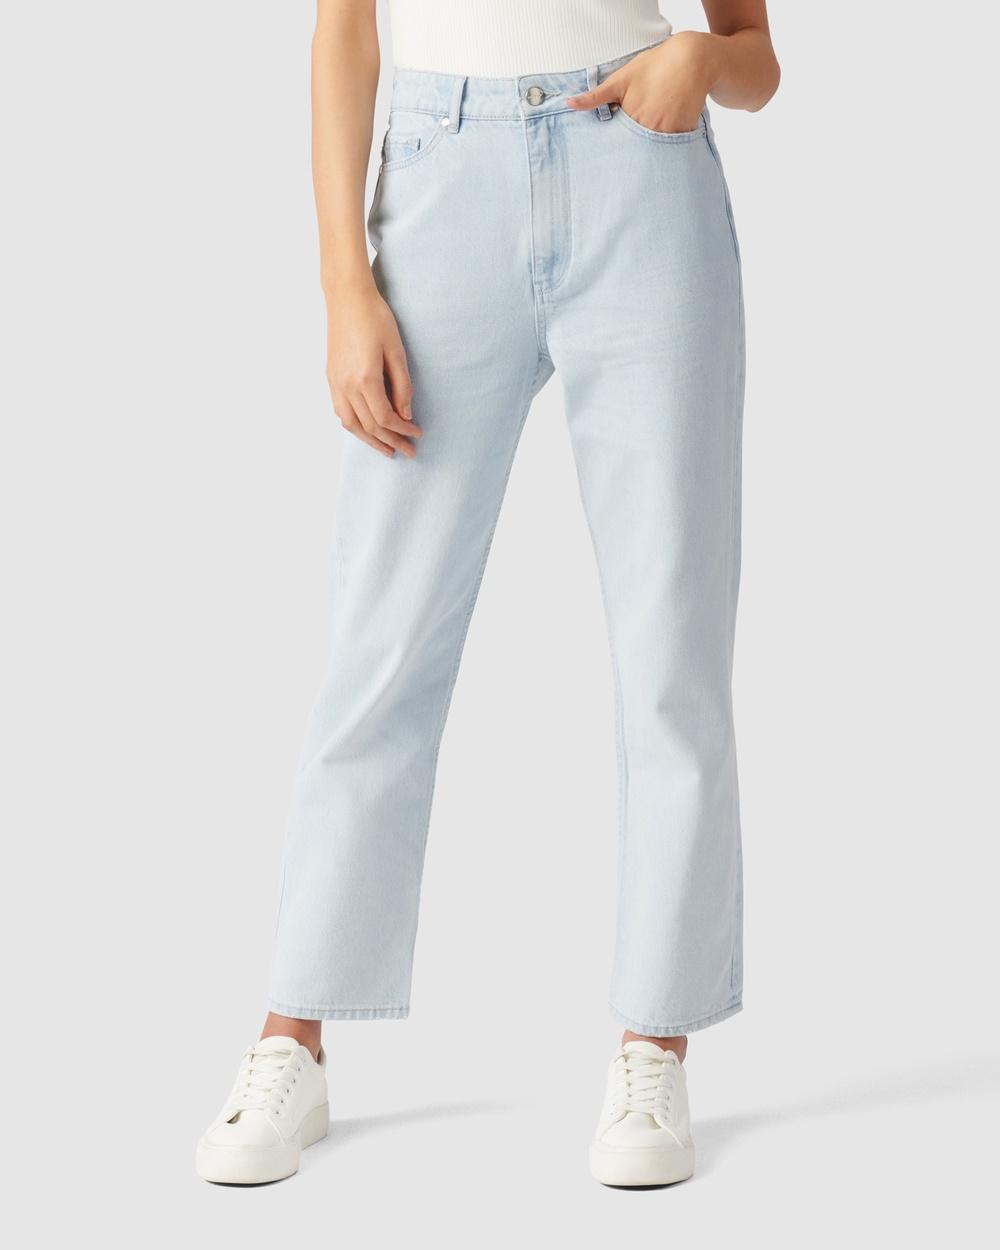 Forever New Tilly High Rise Straight Jean High-Waisted Rome Blue Australia